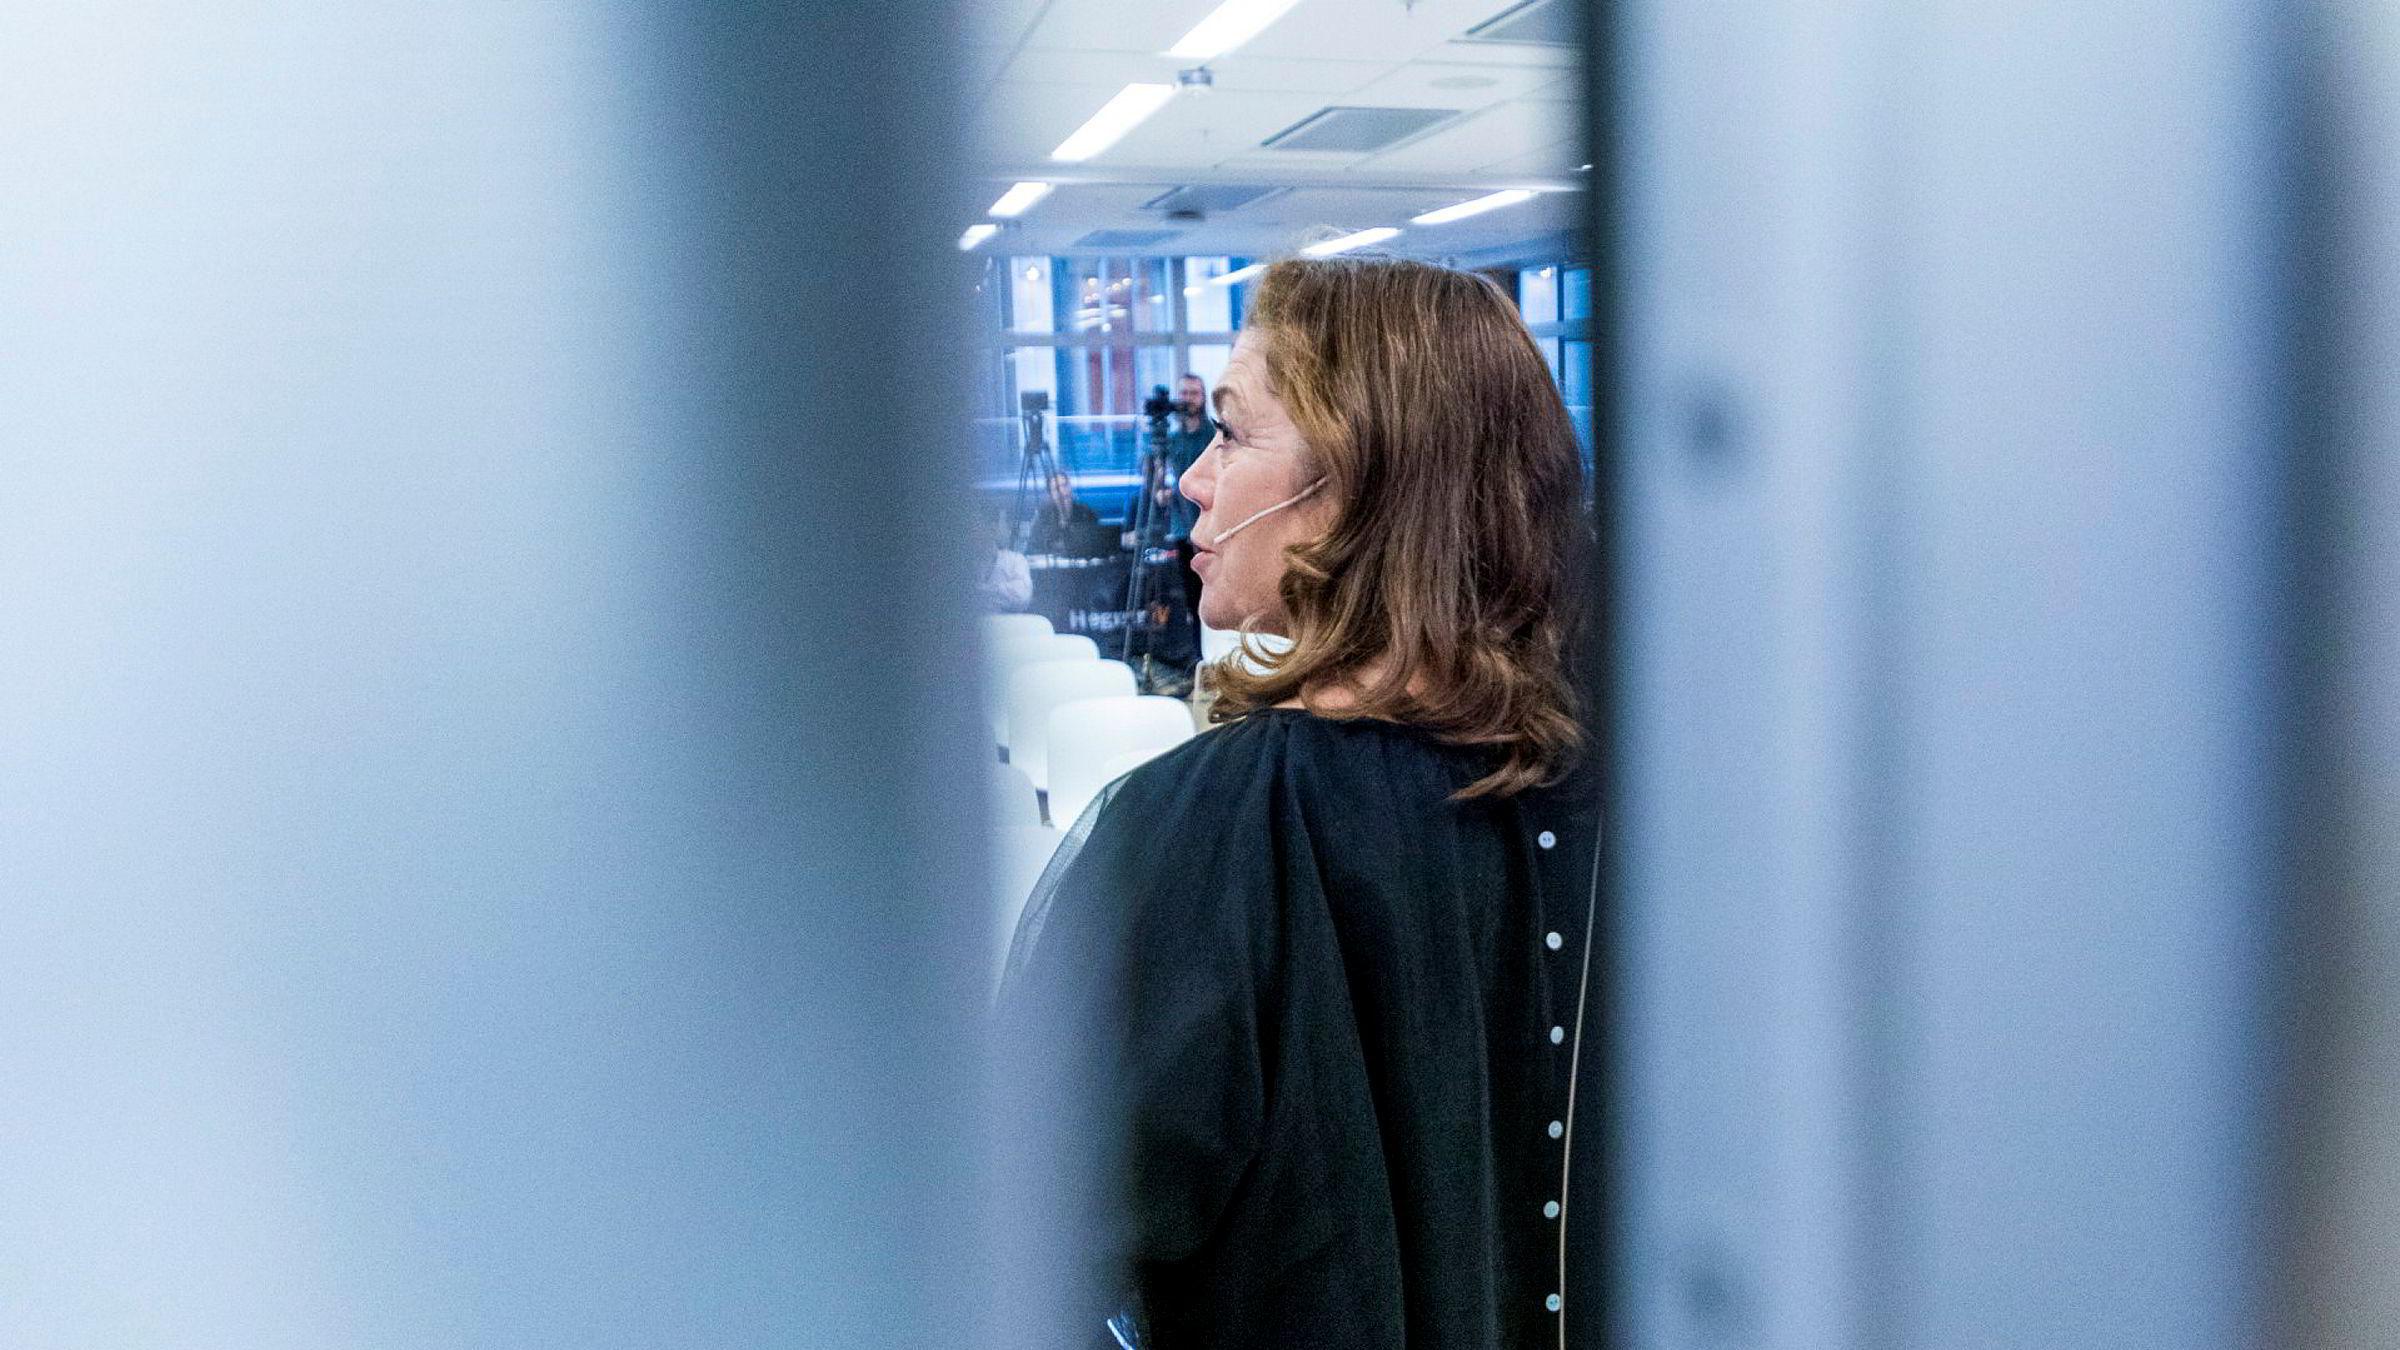 Konsernsjef Kristin Skogen Lund presenterte kvartalsresultatet for Schibsteds tredjekvartal fredag morgen.